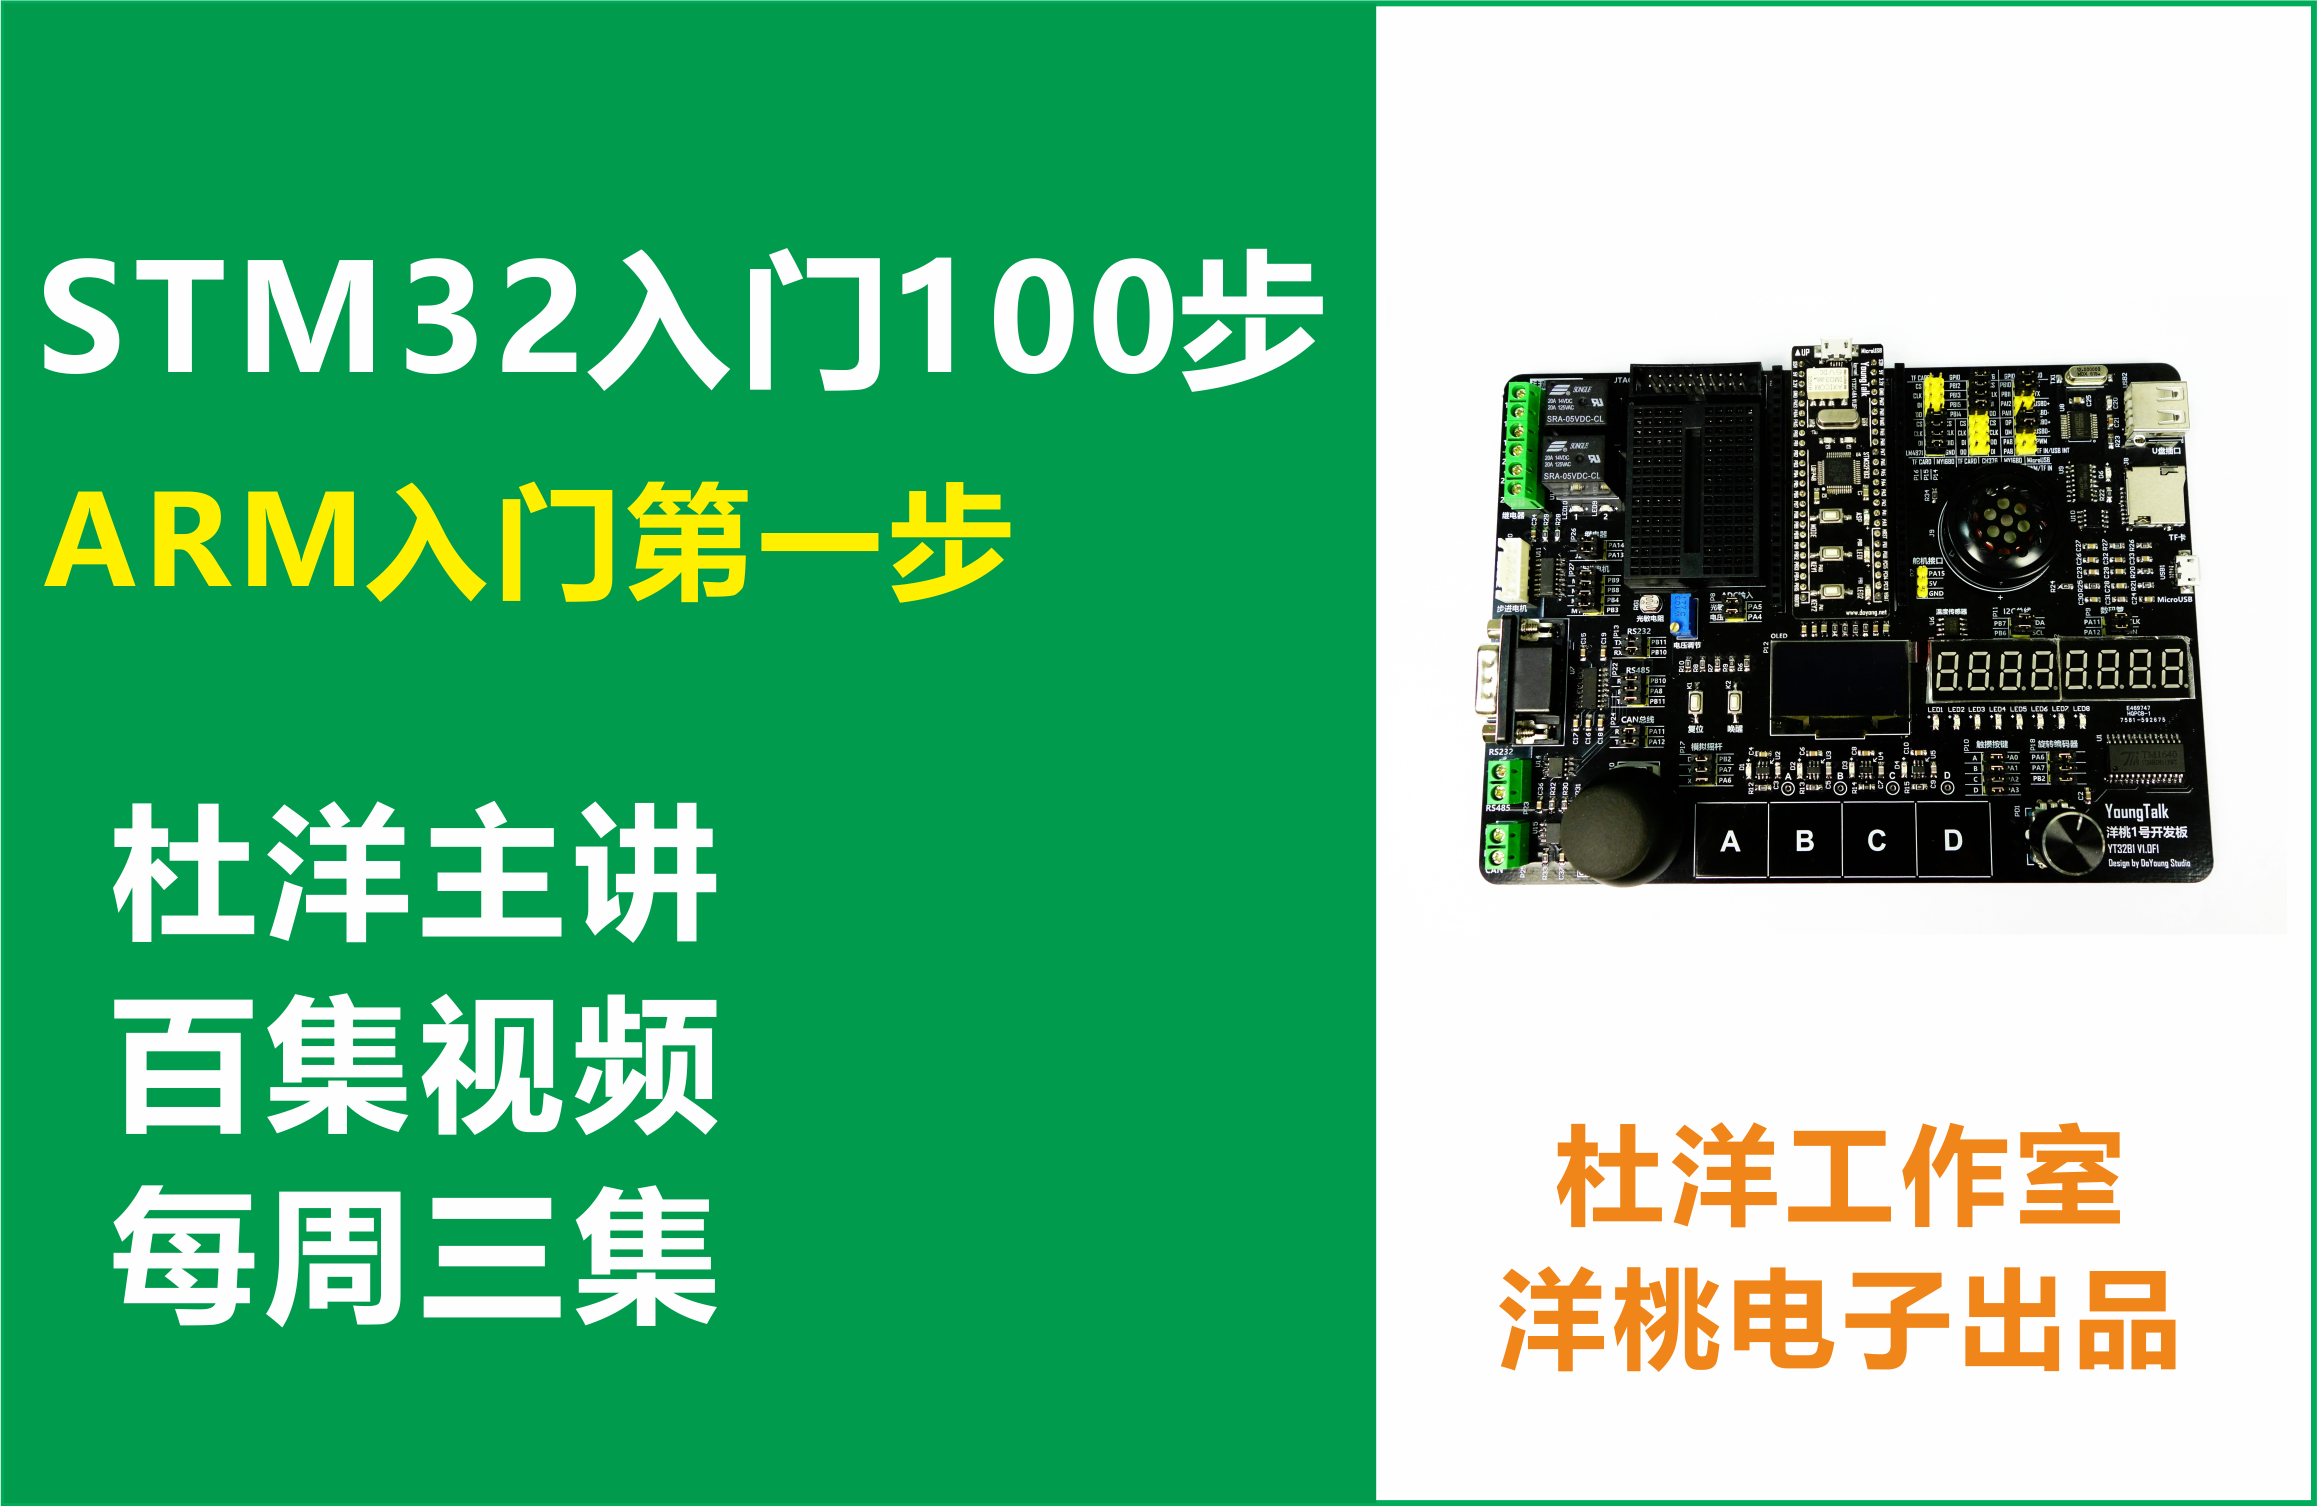 STM32入门100步